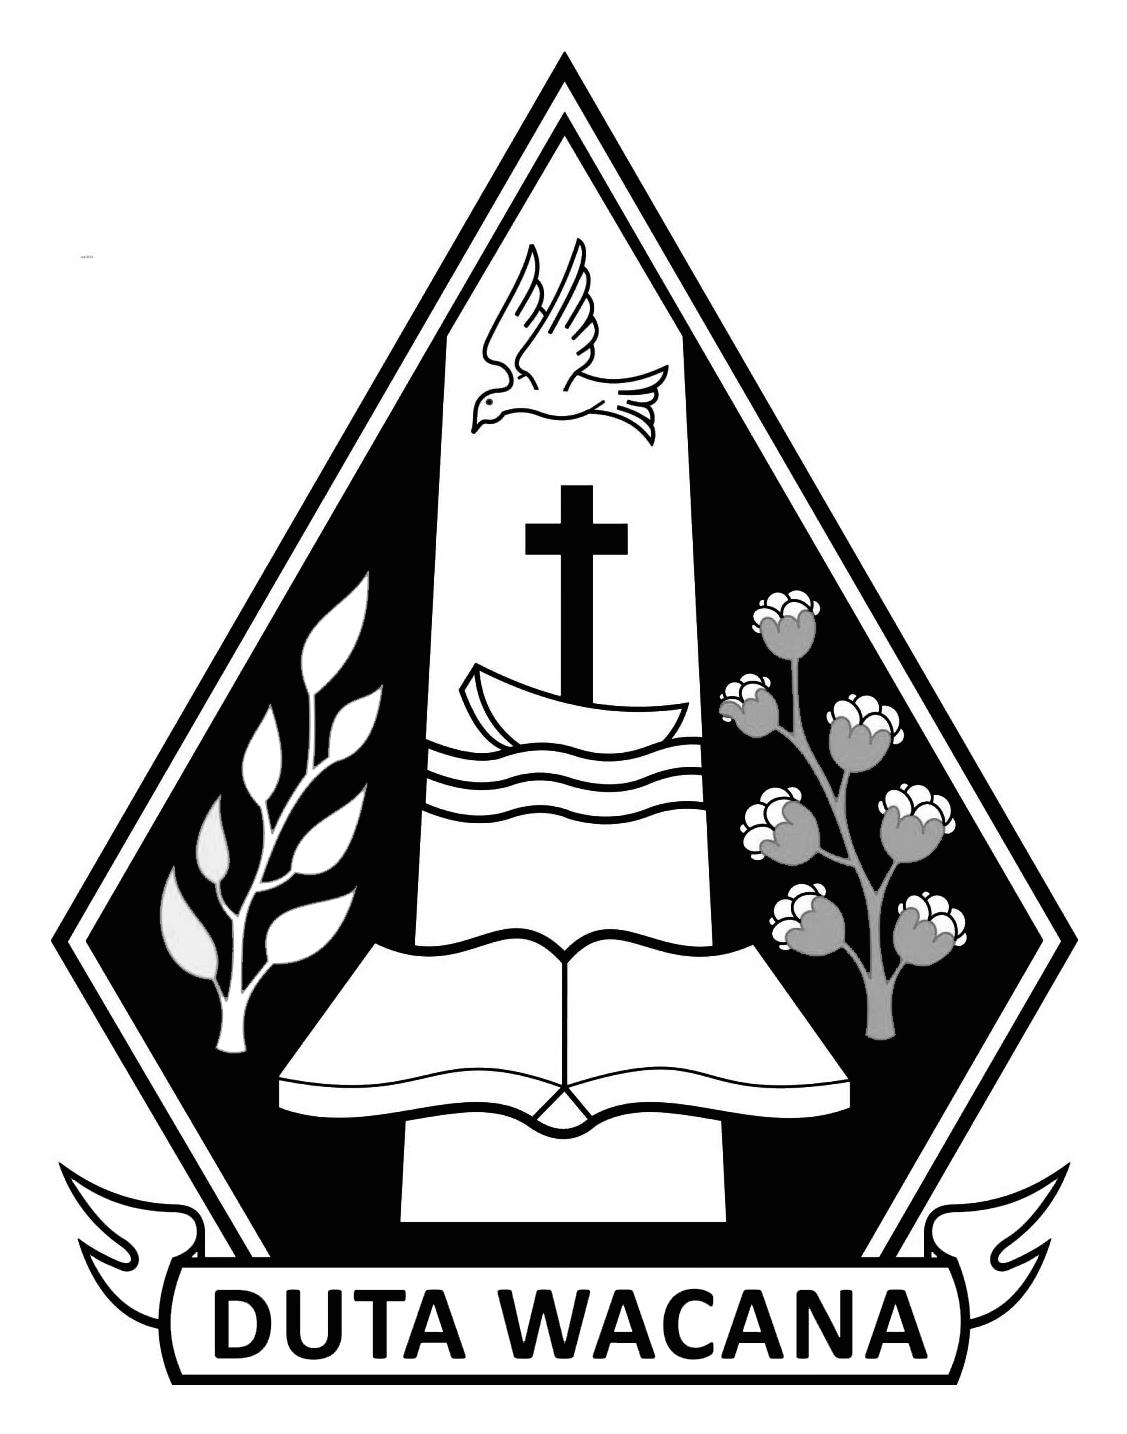 Logo UKDW (Universitas Kristen Duta Wacana) Original Hitam Putih